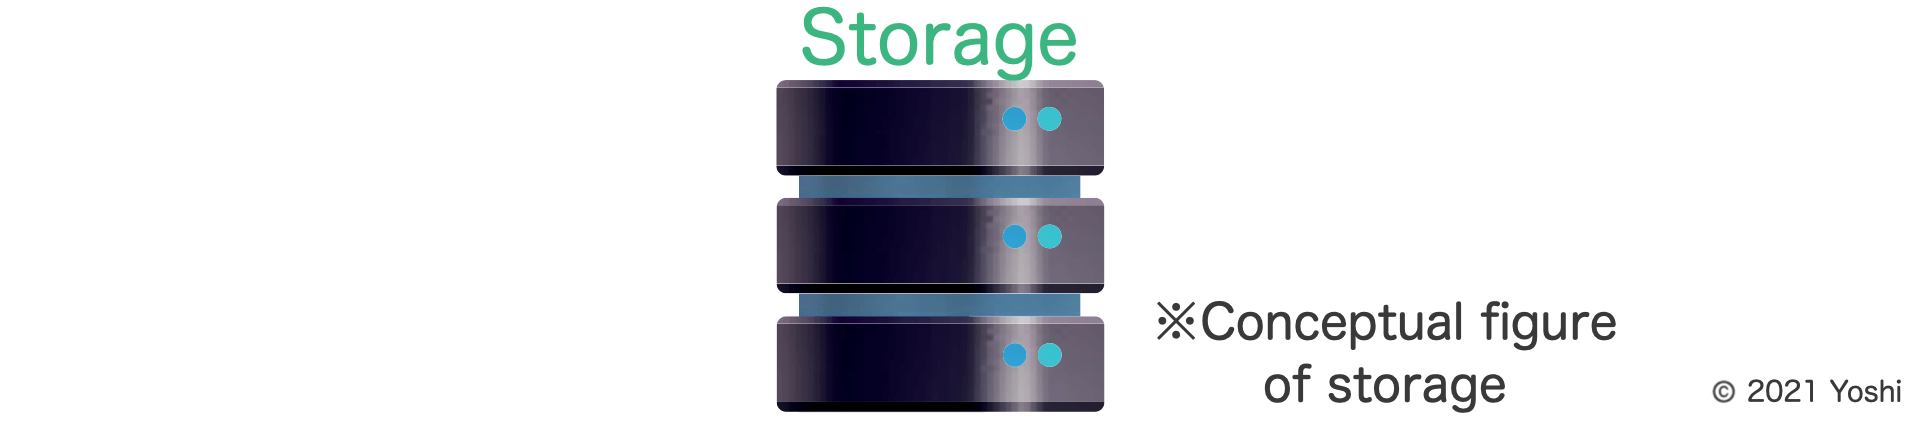 concept image of storage